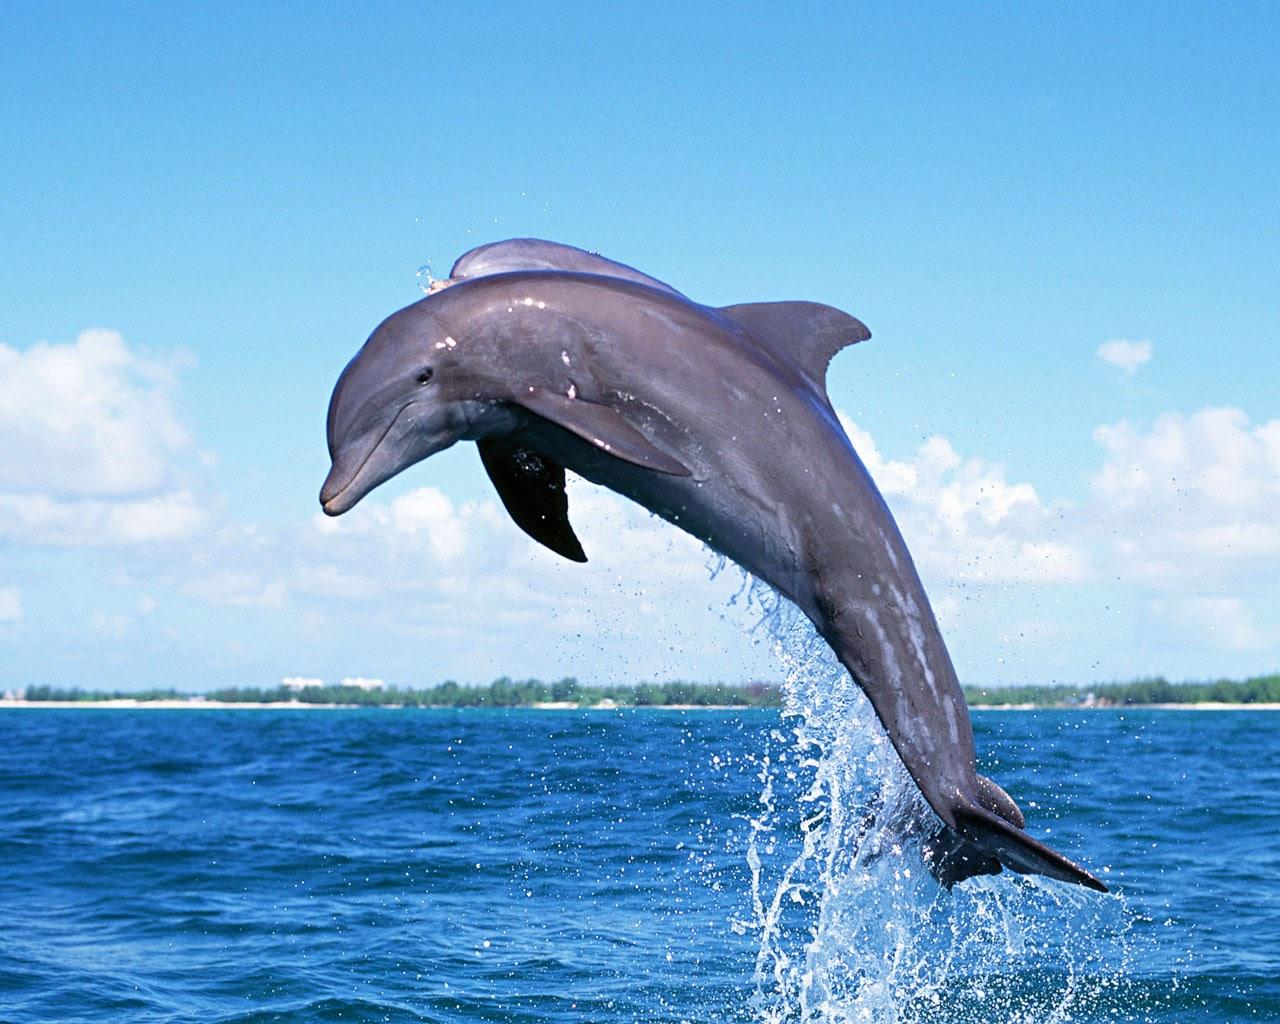 http://beautifulwallpapersfordesktop.blogspot.com/2014/01/dolphin-wallpapers.html